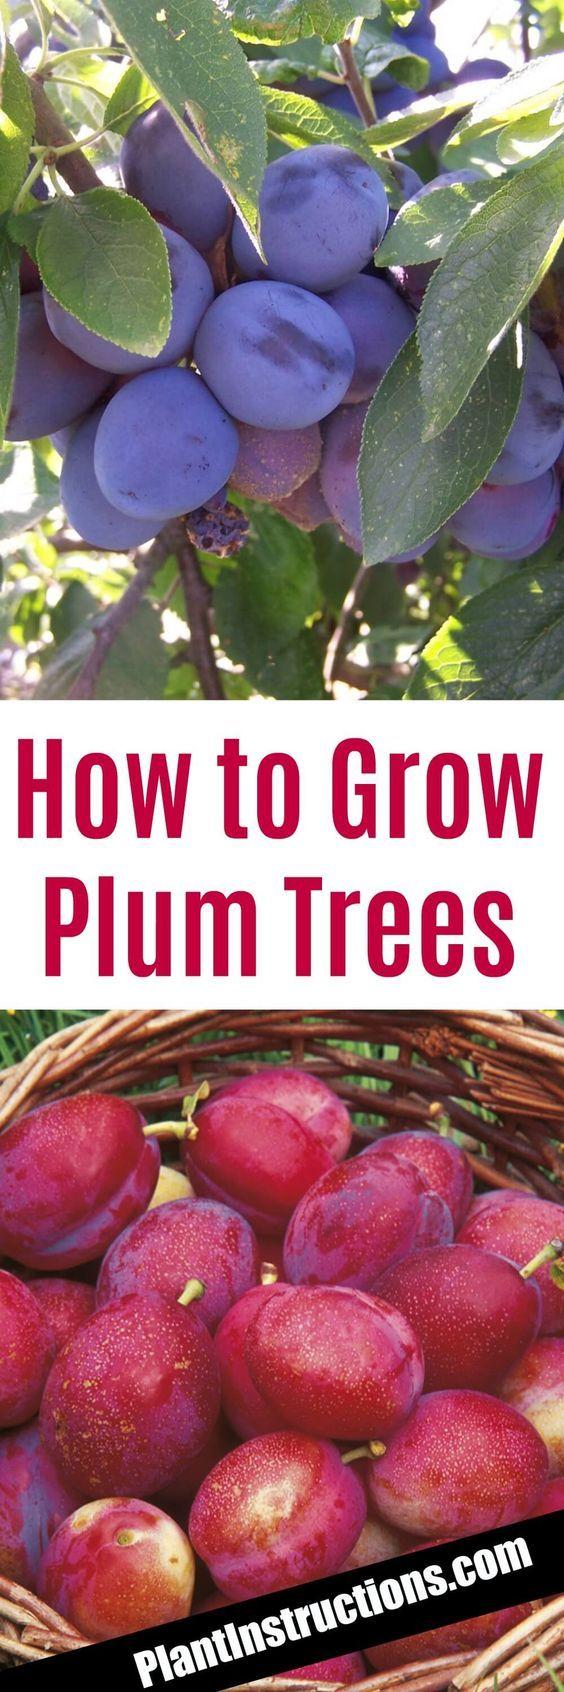 How to Grow Plum Trees